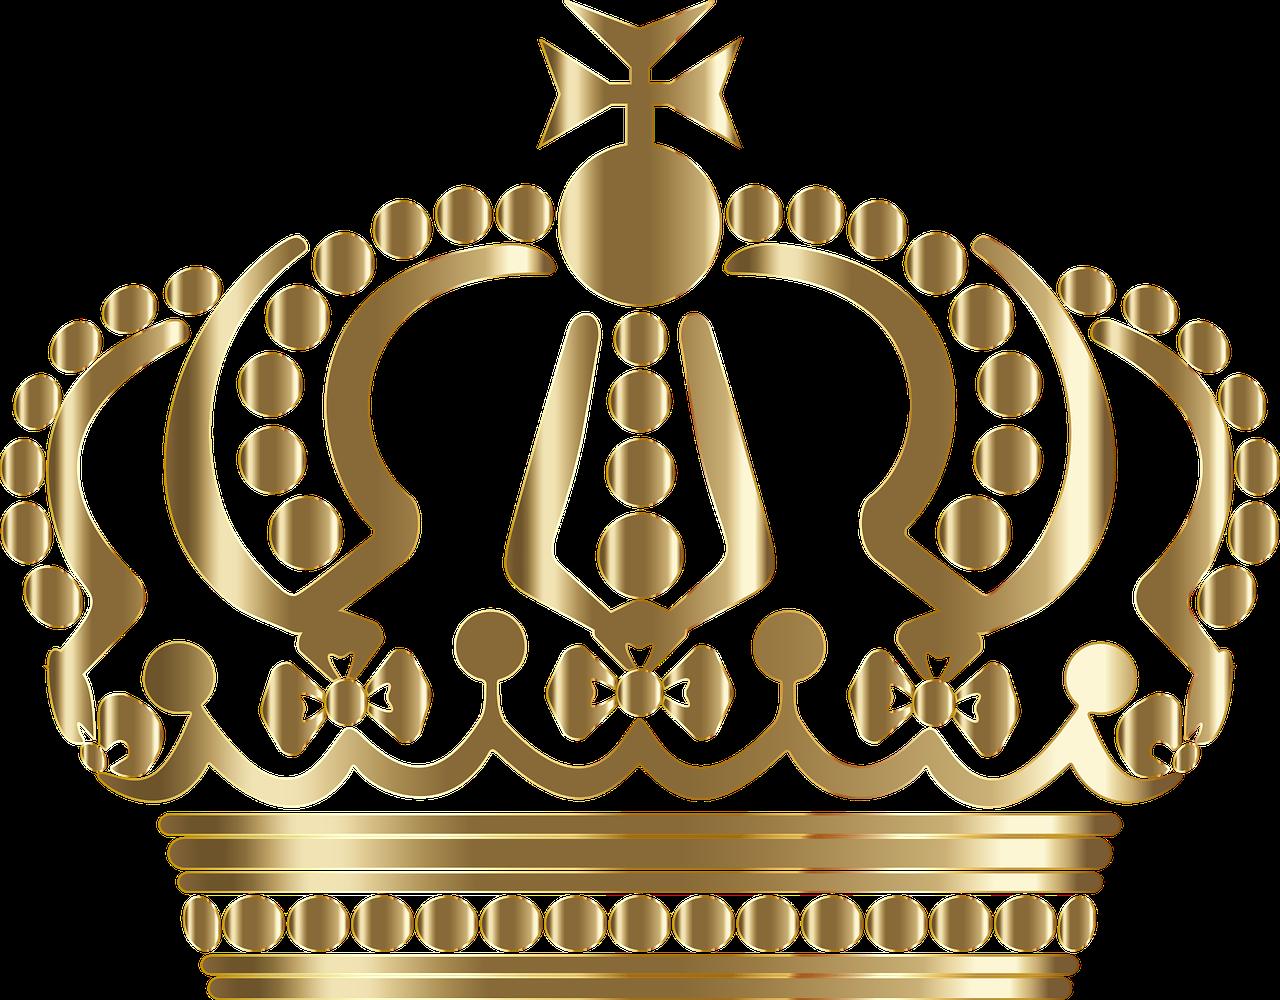 Фразы, картинки с короной